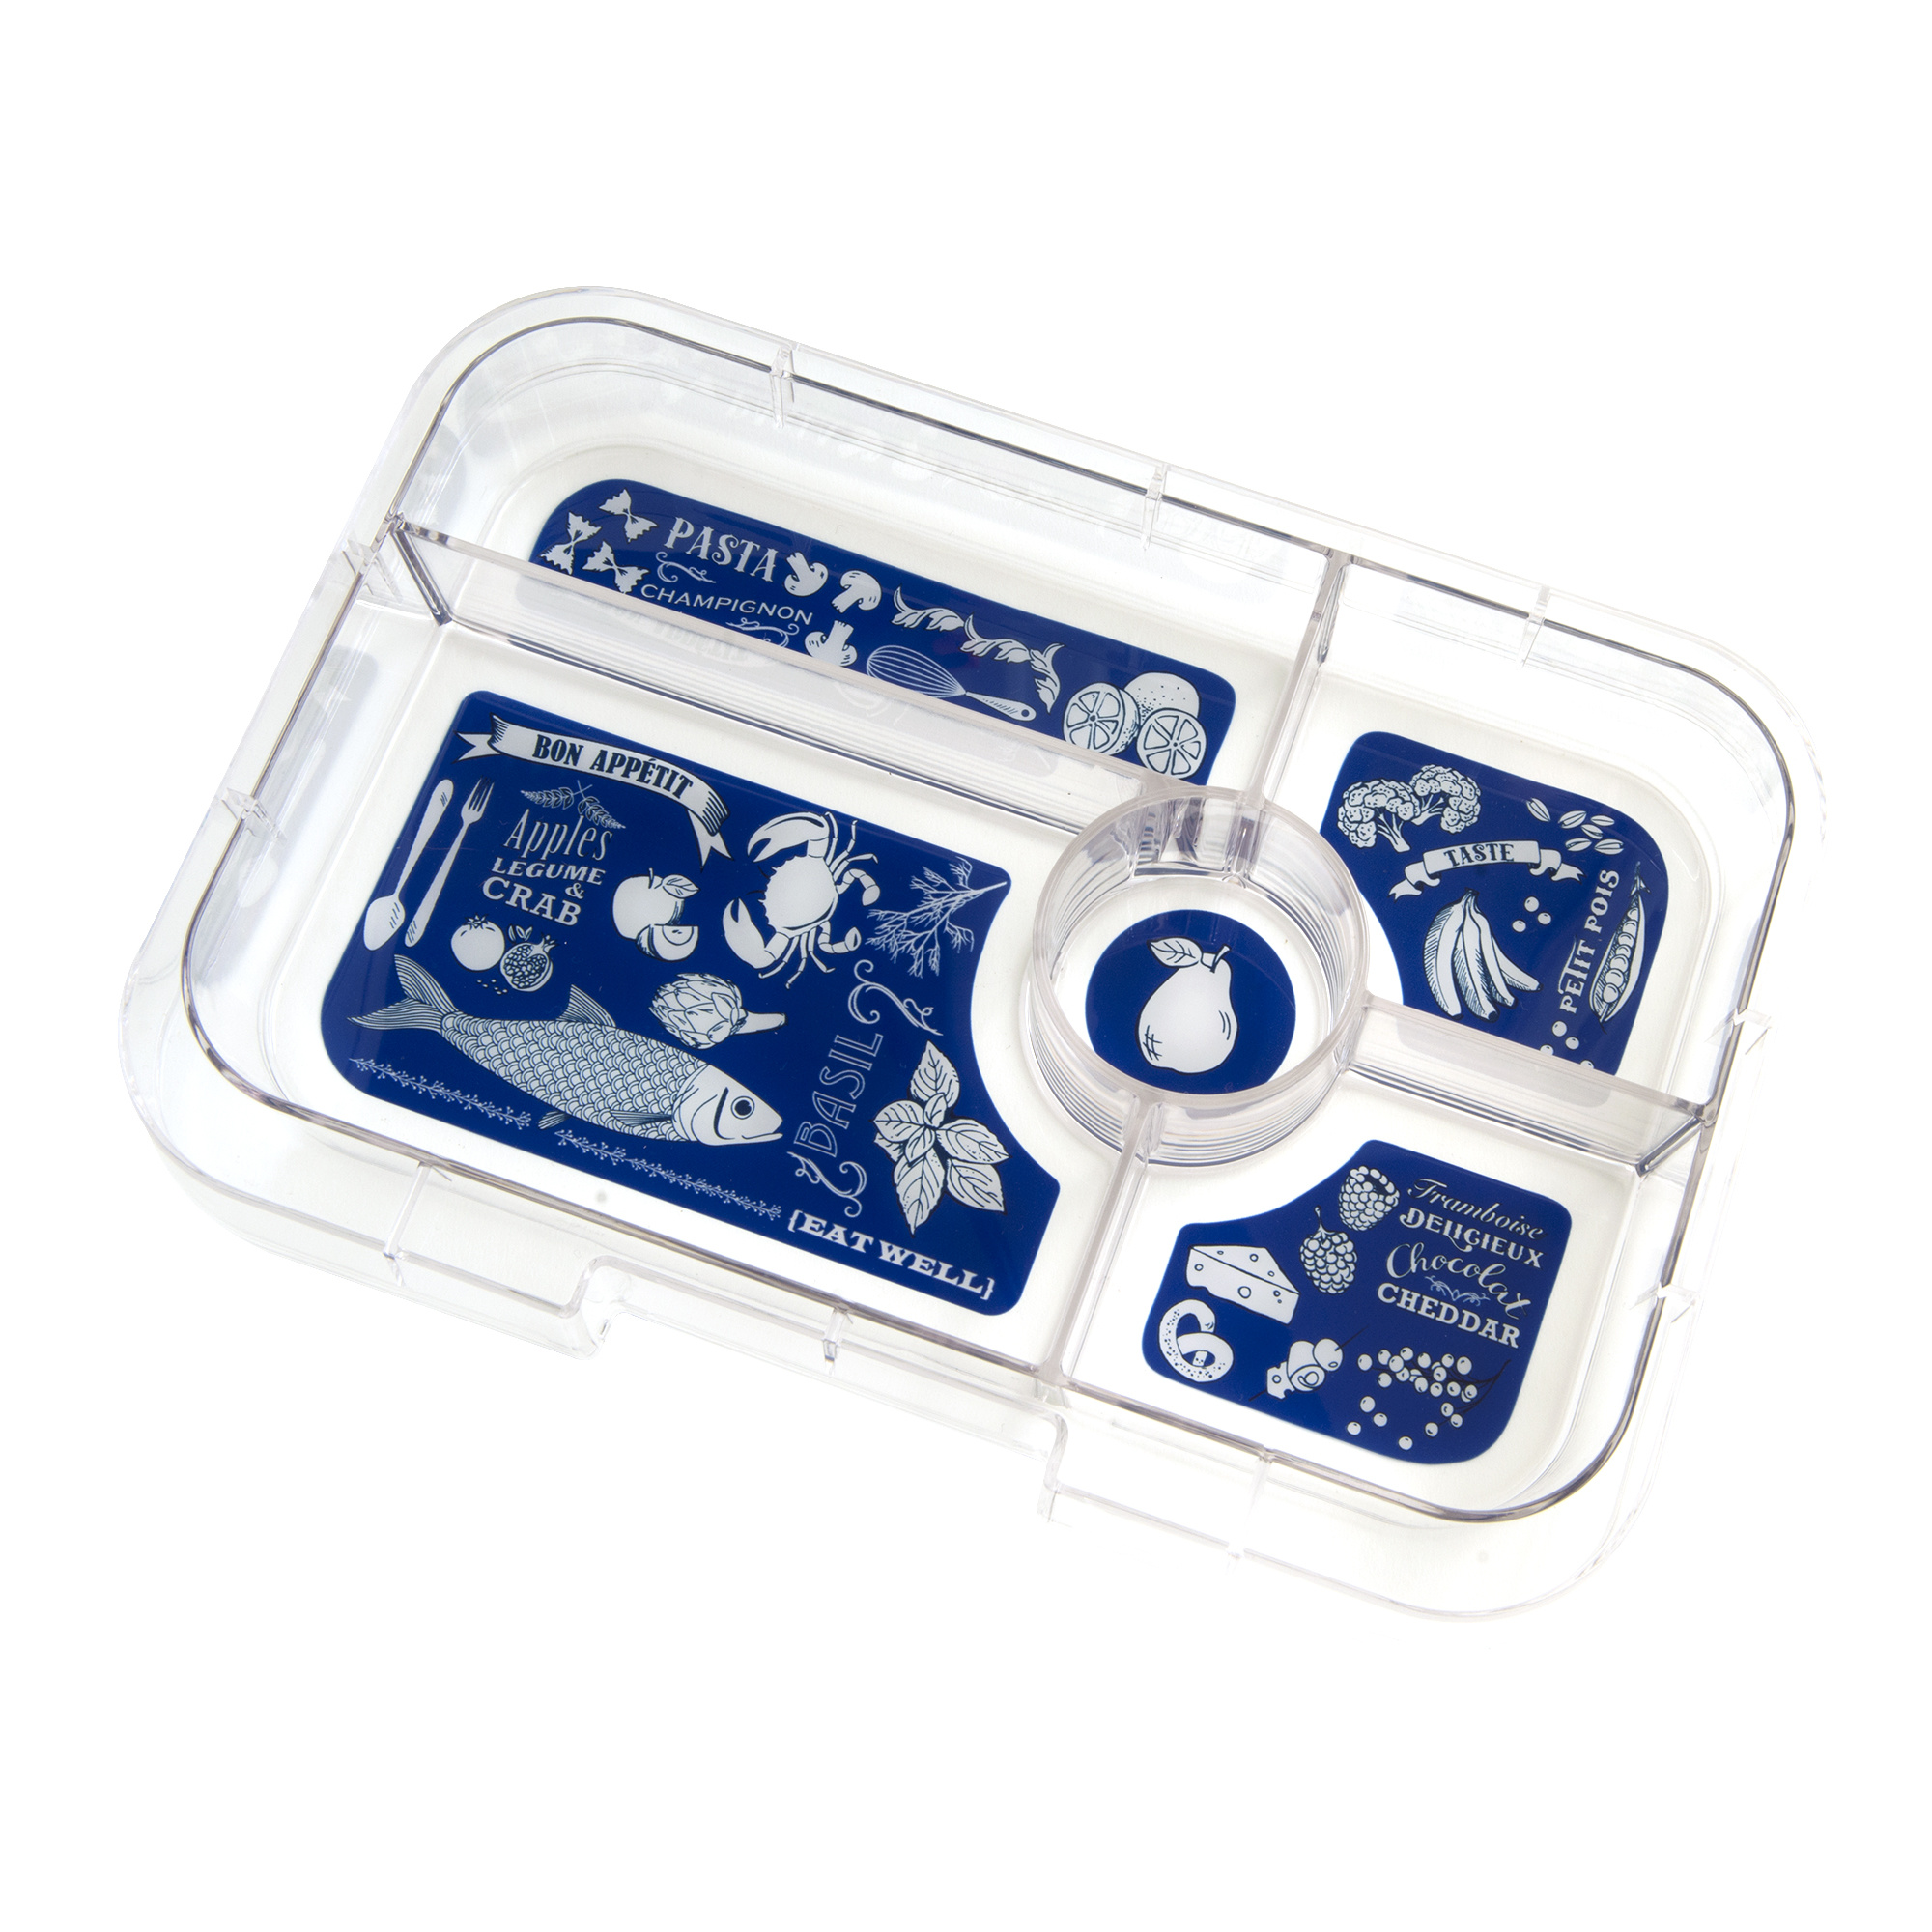 Yumbox Tapas XL broodtrommel Portofino blauw / Bon appetit 5 vakken-4